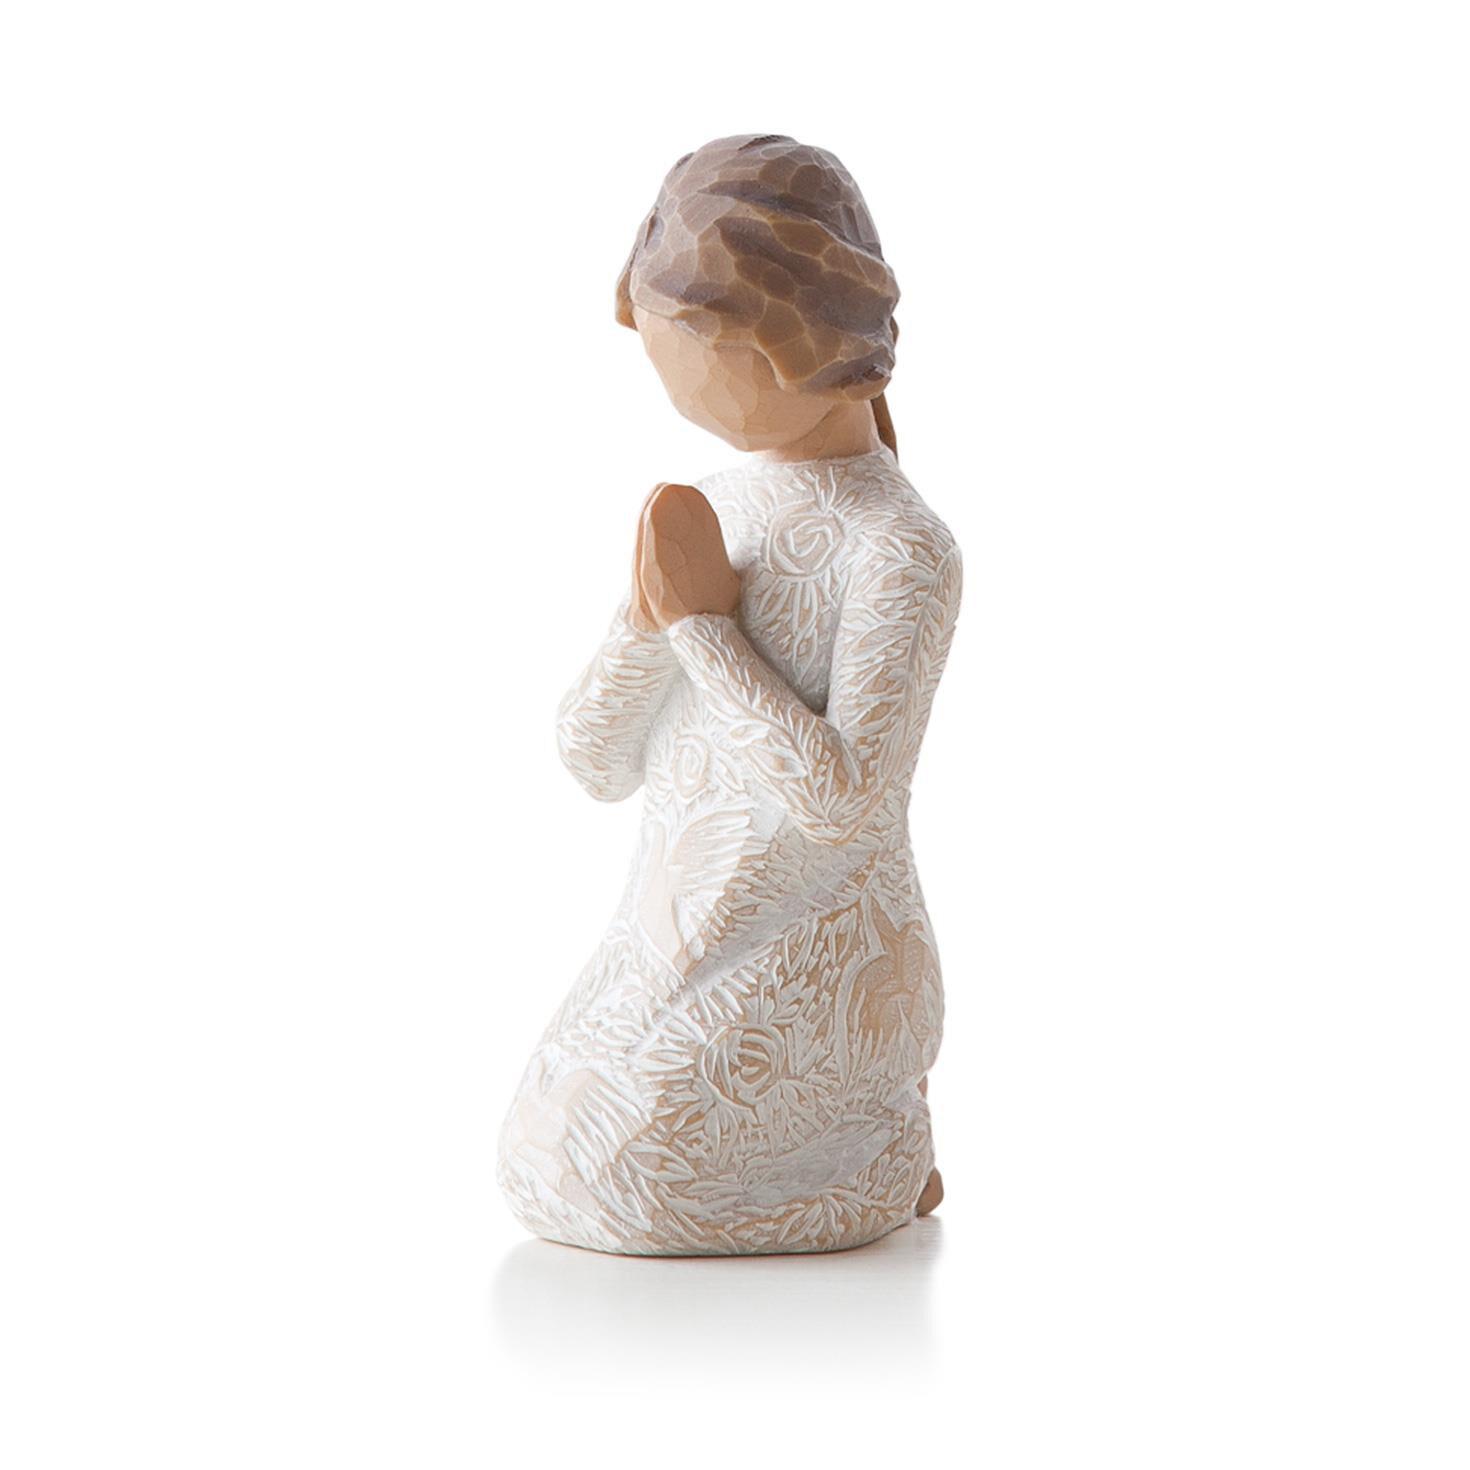 willow tree prayer of peace figurine figurines hallmark. Black Bedroom Furniture Sets. Home Design Ideas